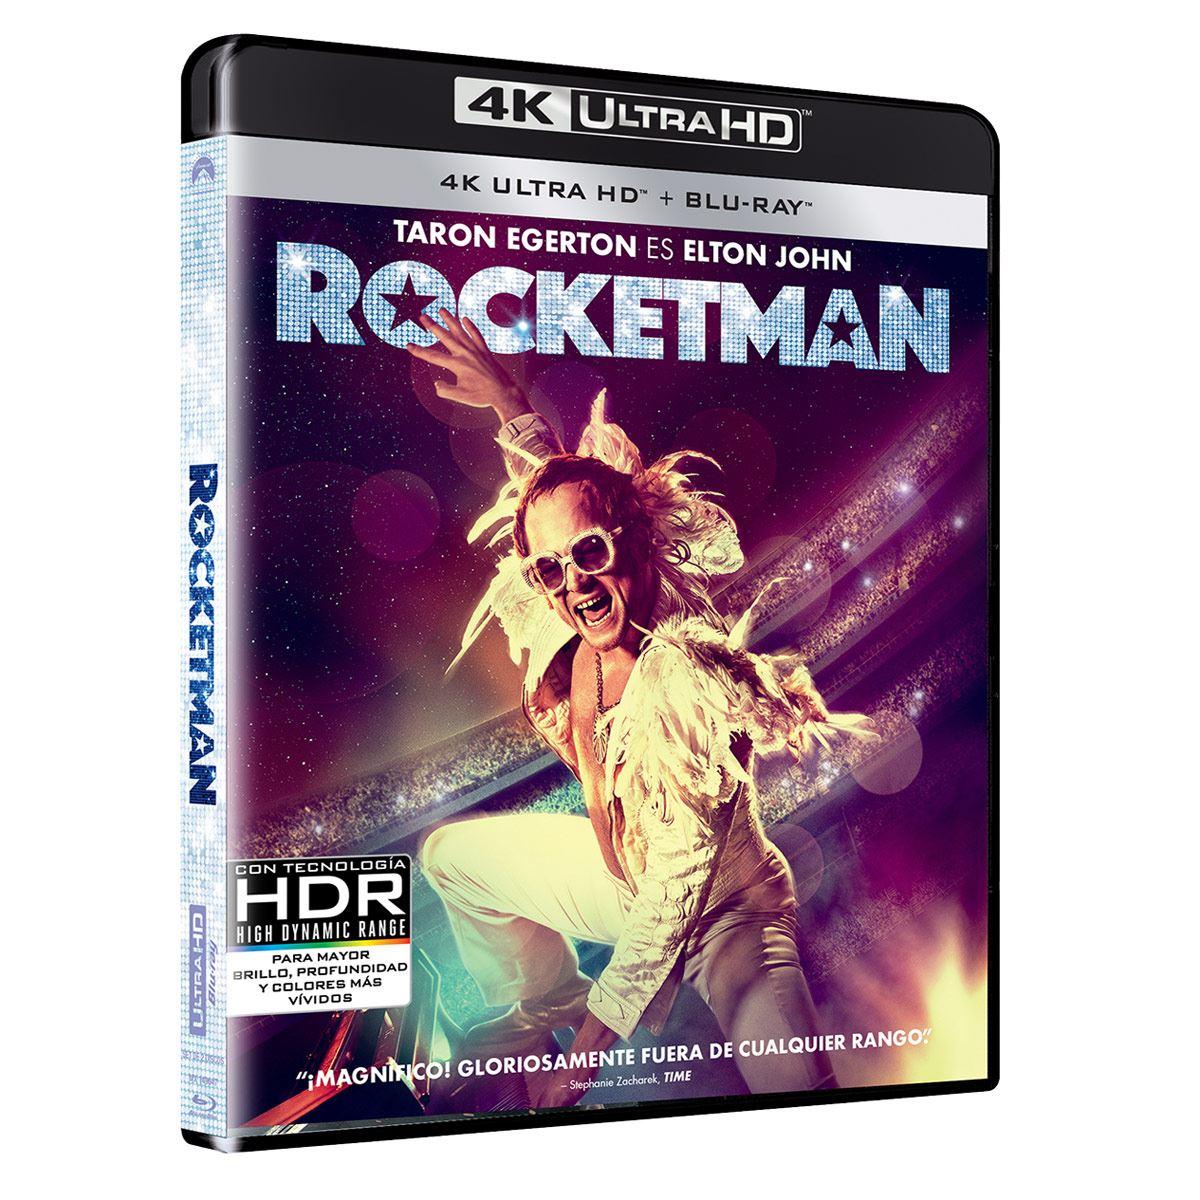 4K Rocketman